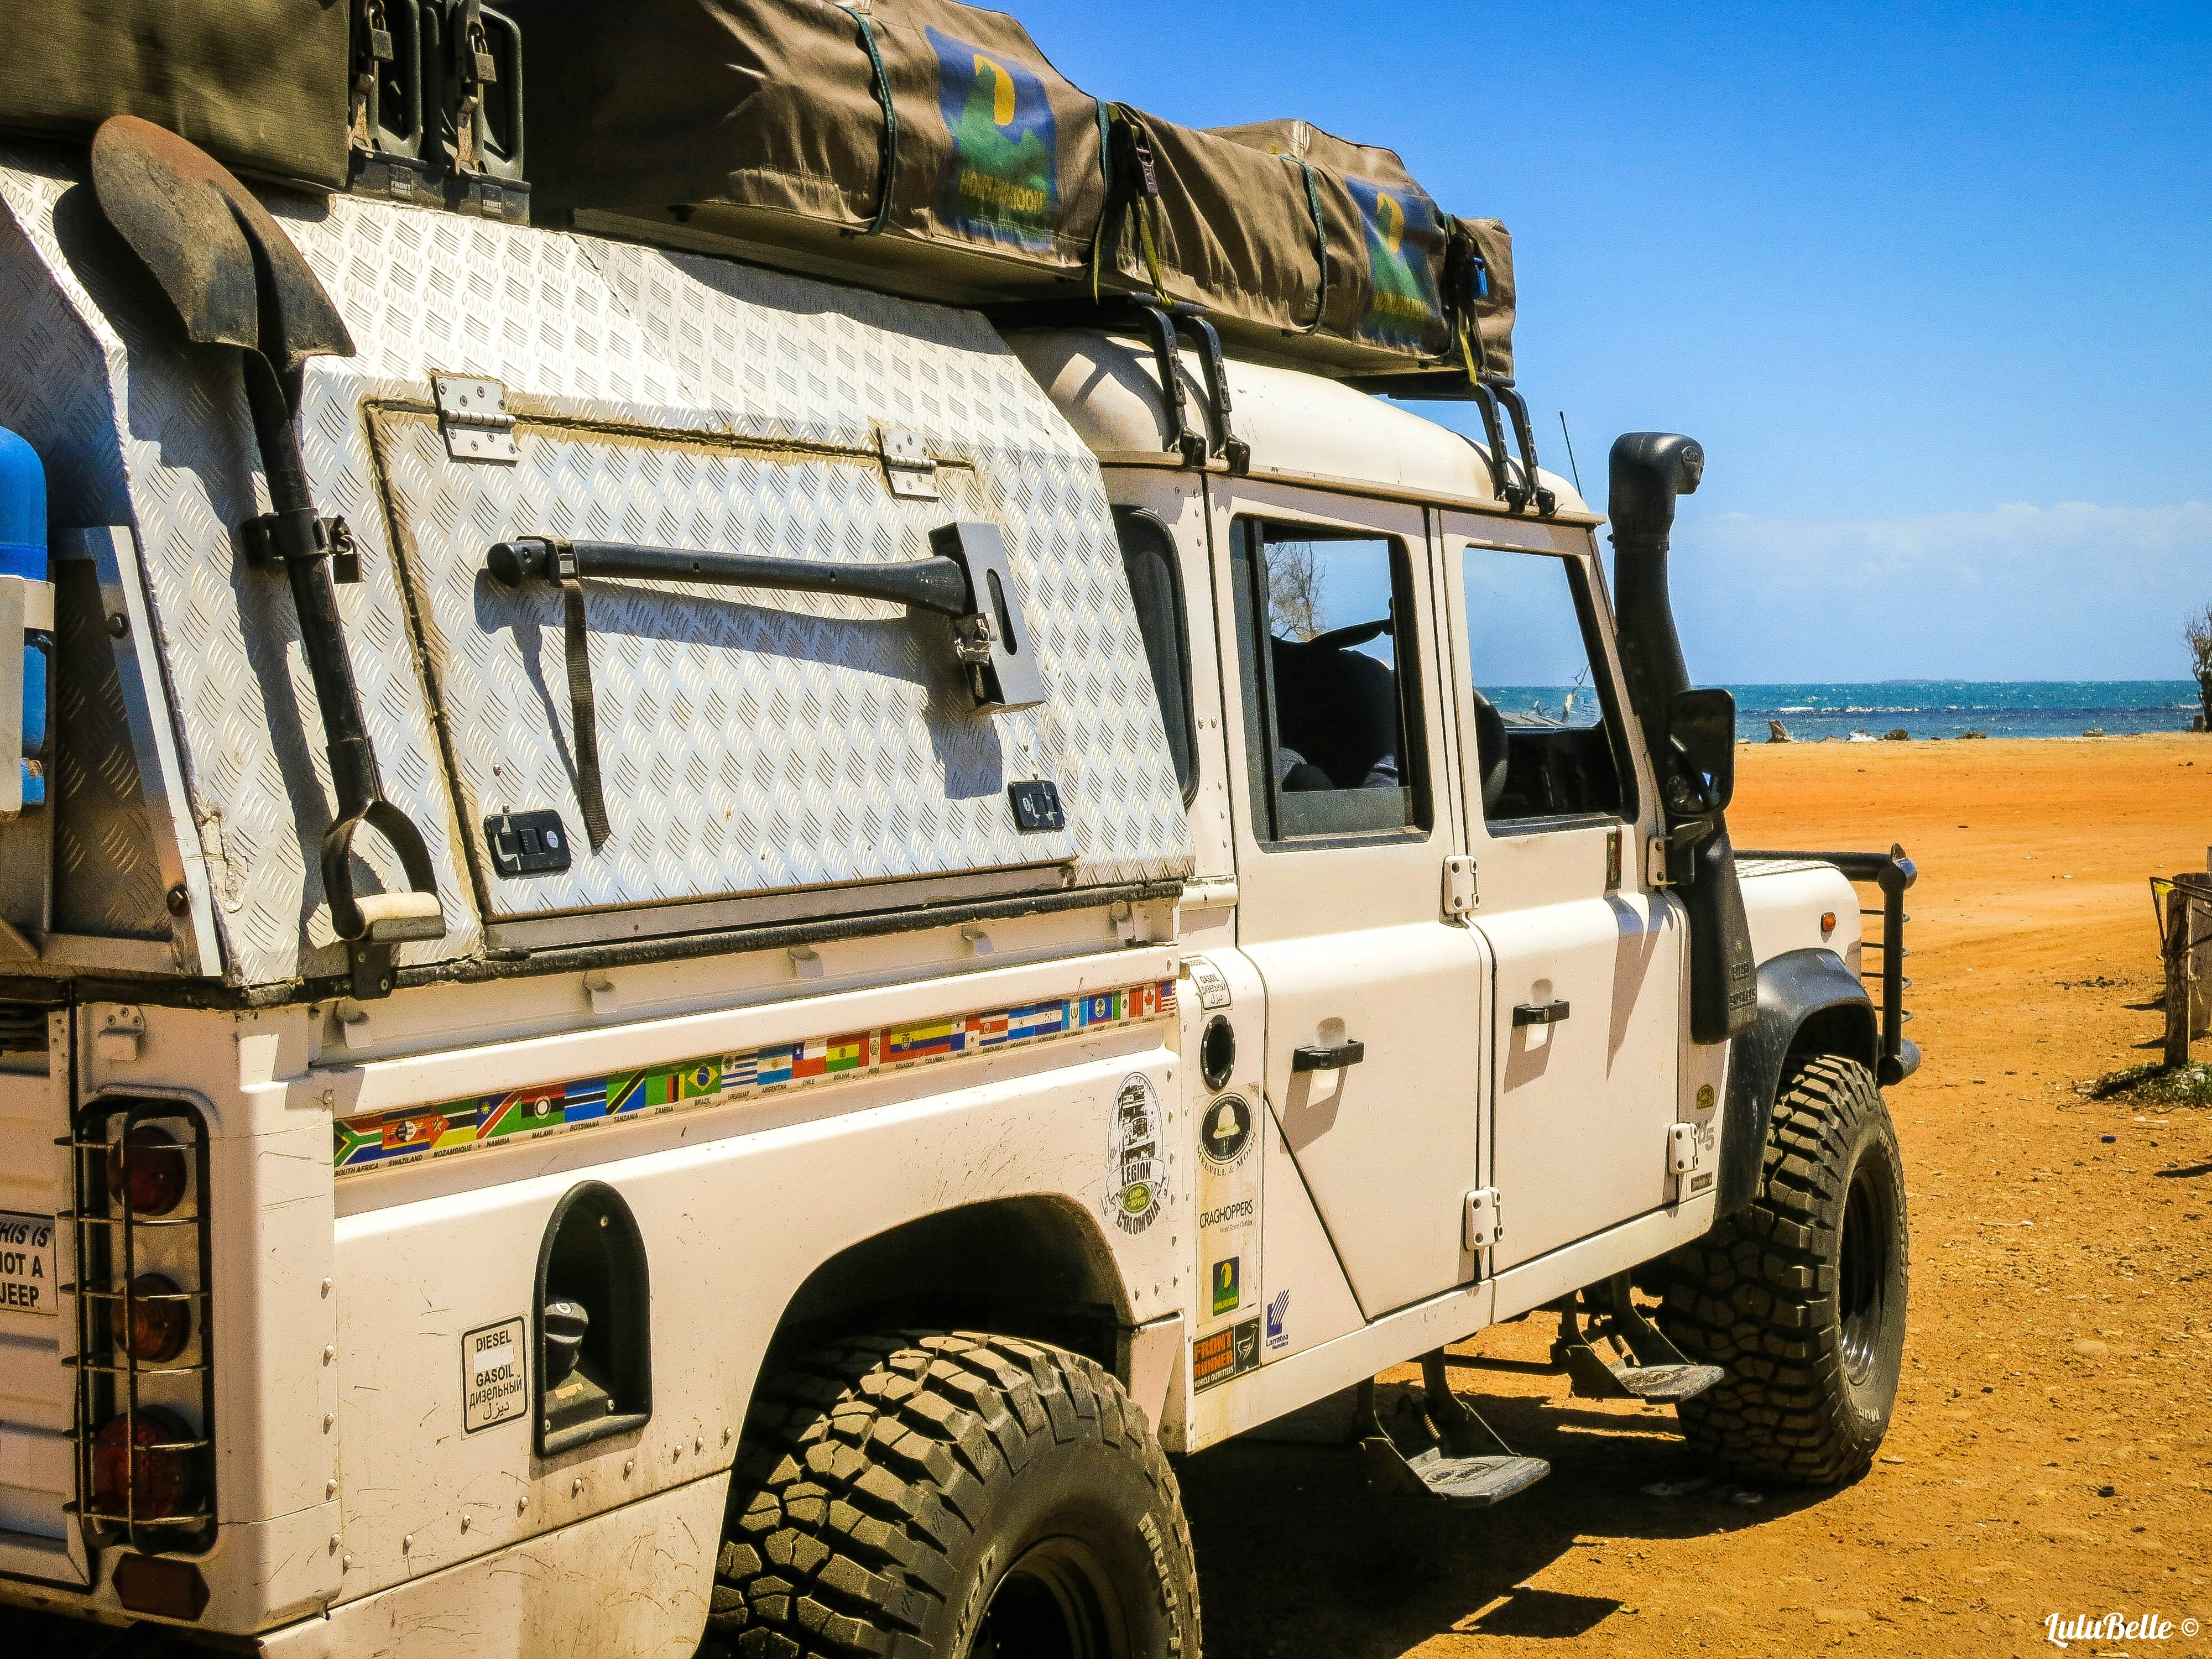 On the beach, A2A Expedition